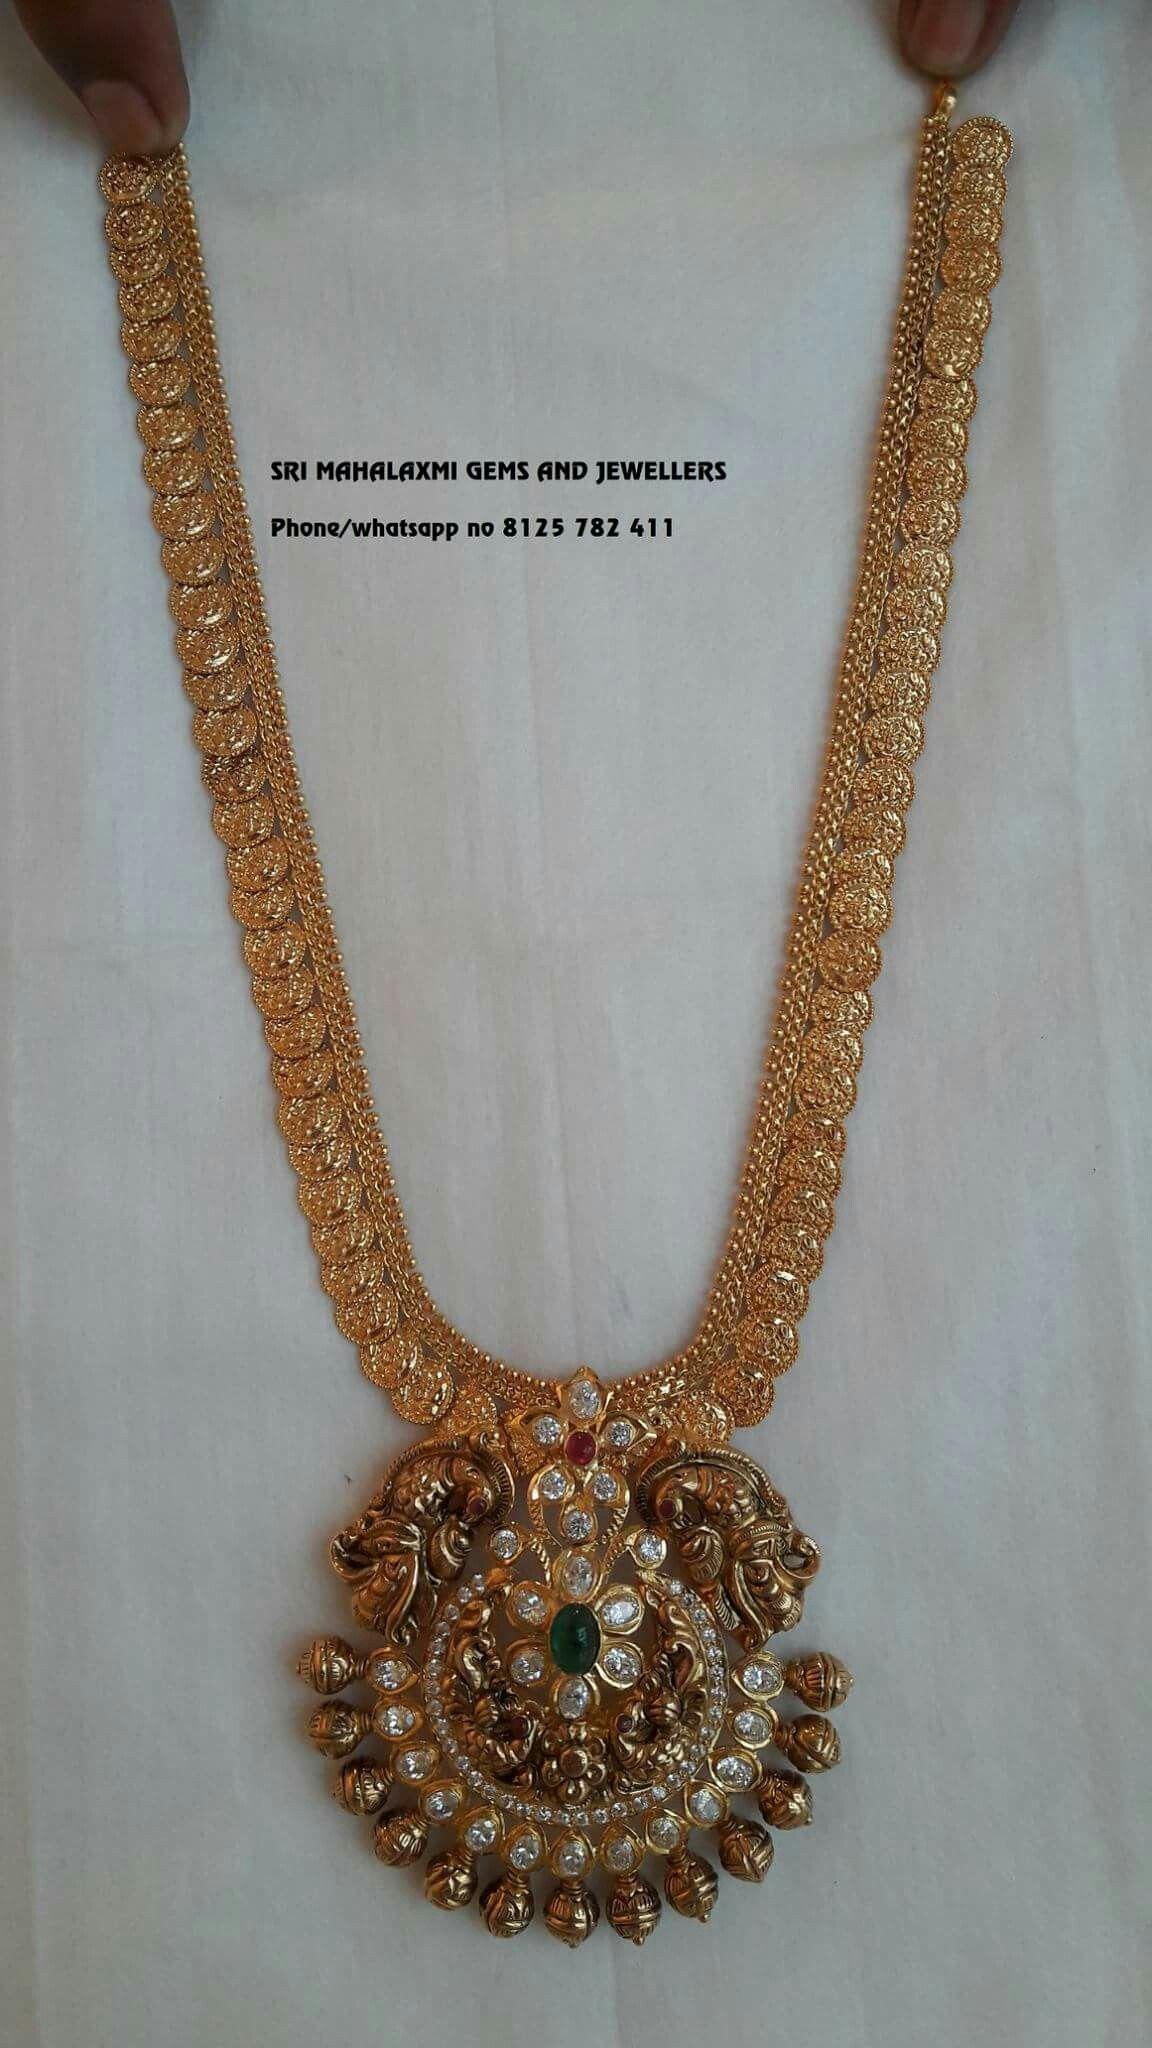 Pin By Raviraj Shettar On Indian Jewellery Tradition And Wedding Gold Jewelry Fashion Bridal Gold Jewellery Designs Gold Jewellery Design Necklaces